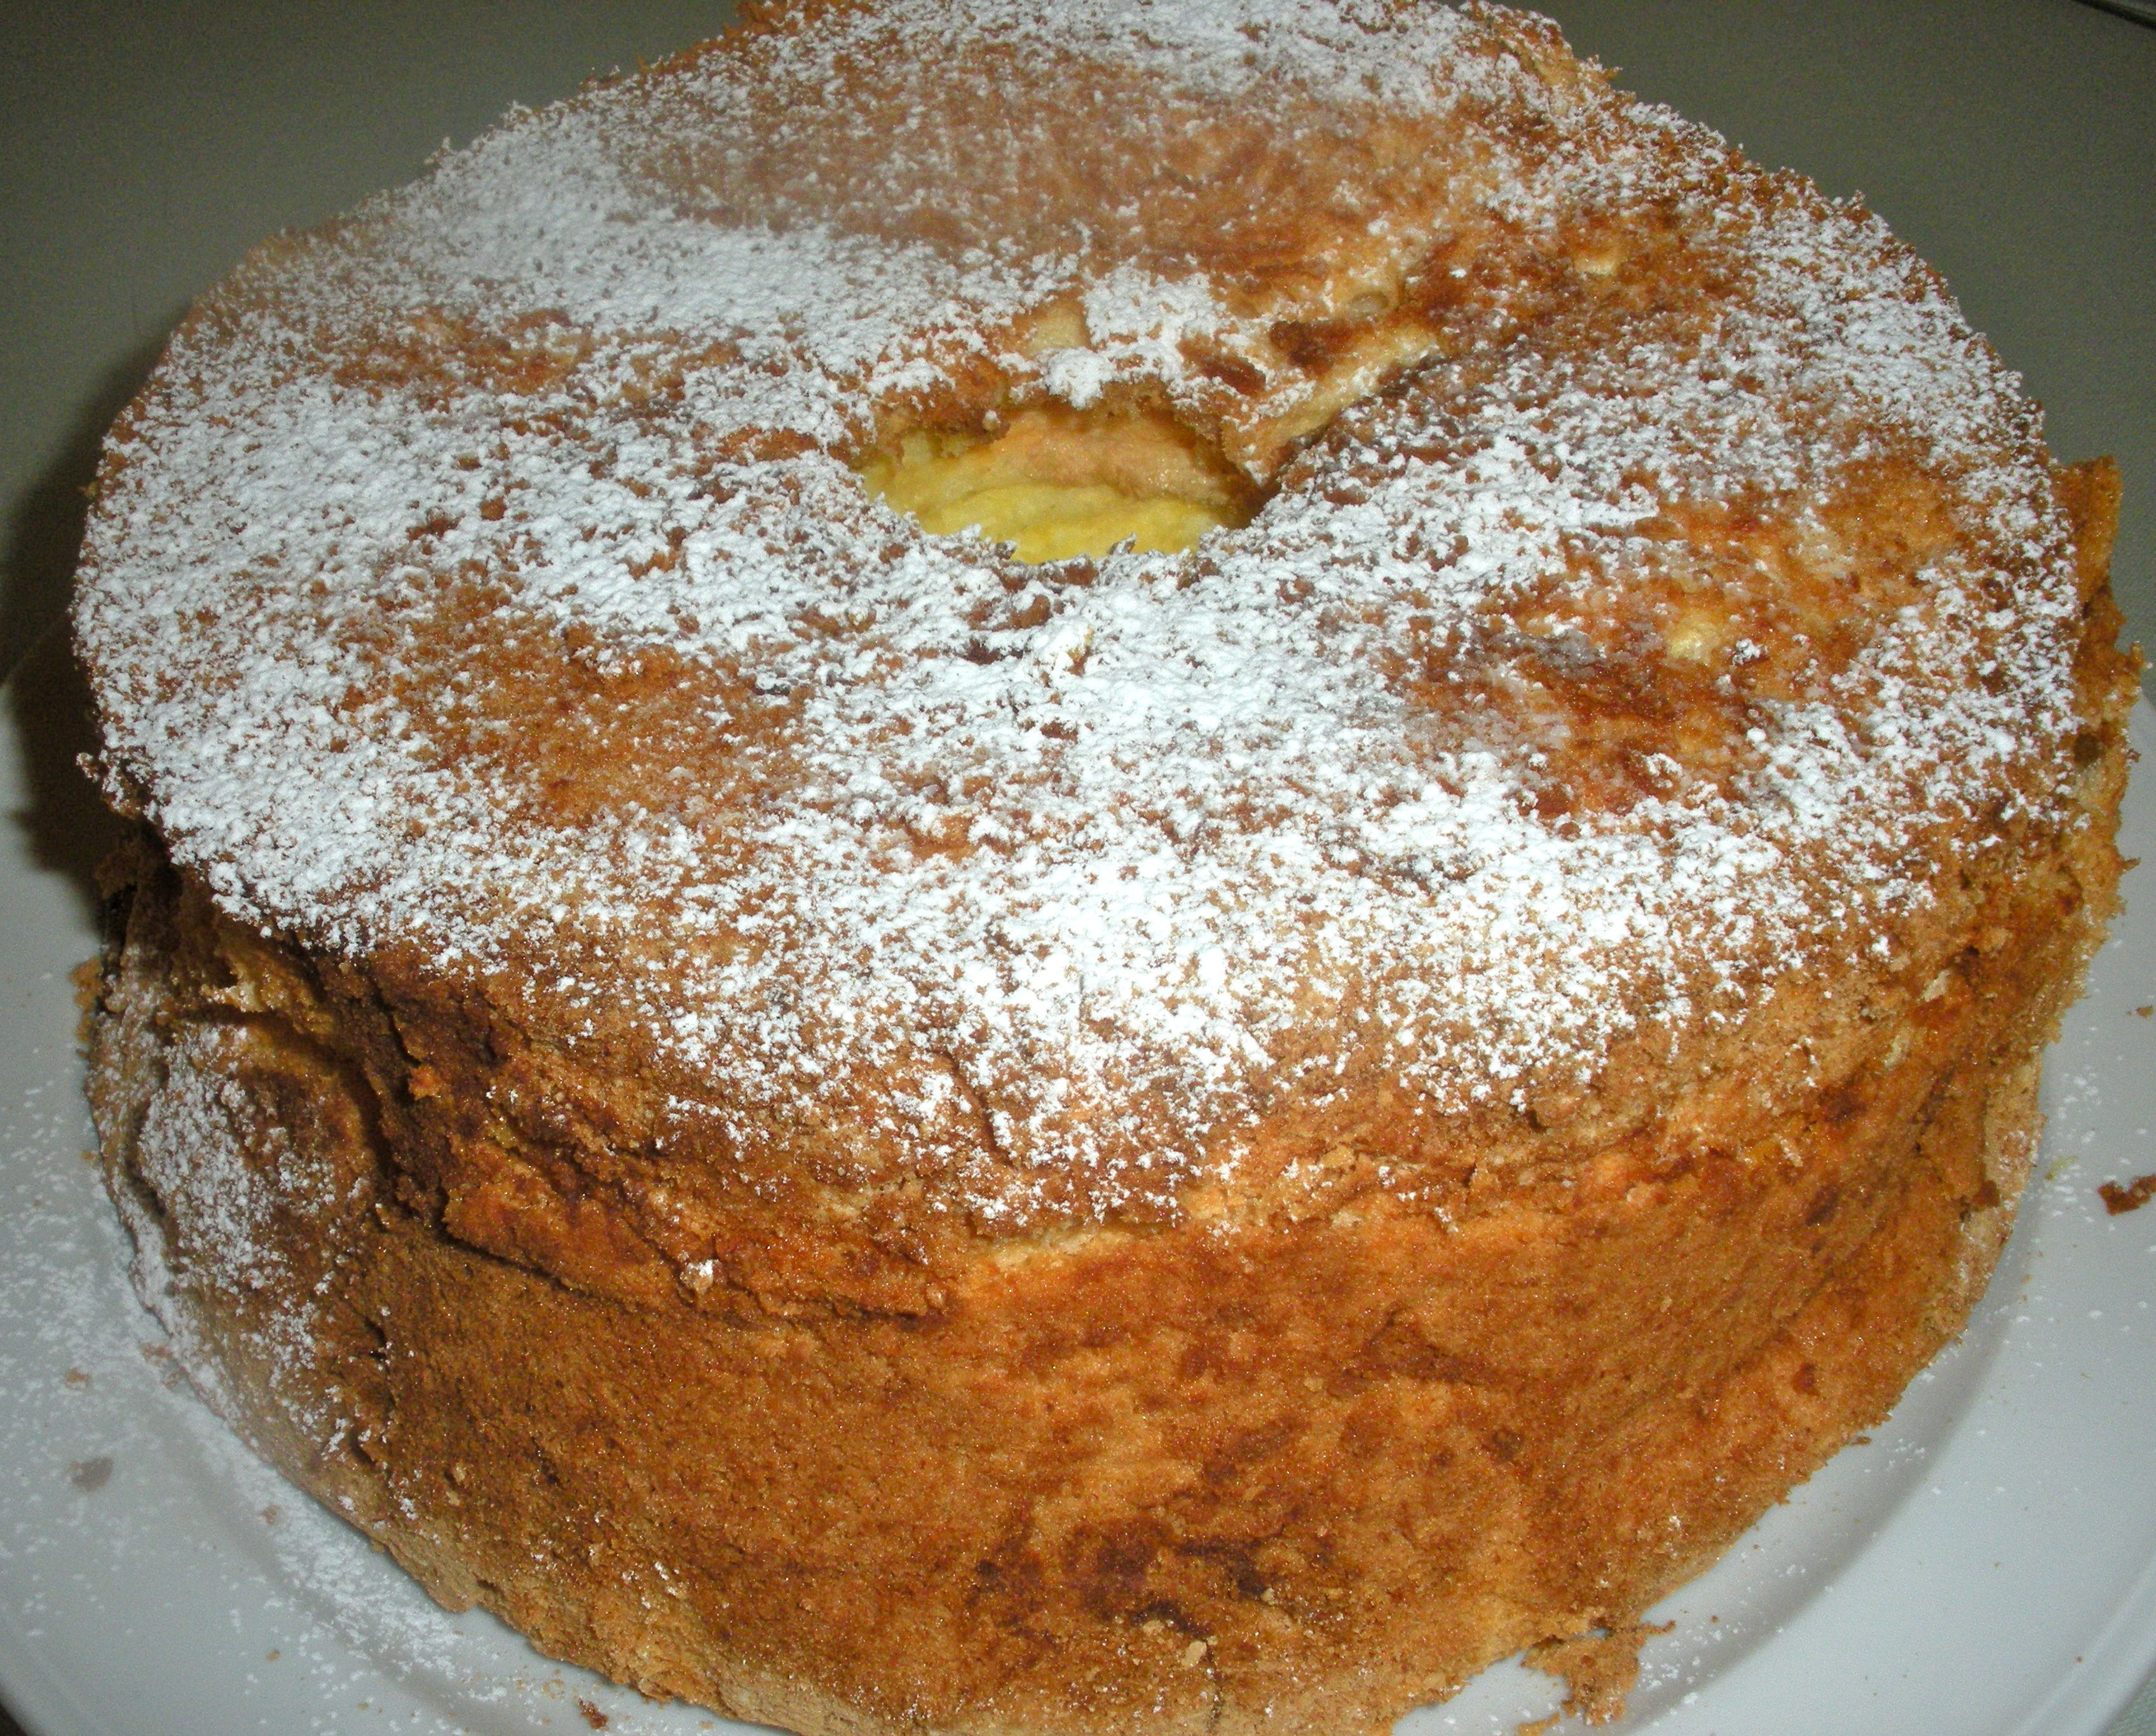 Passover Sponge Cake Recipes  Passover Lemon Sponge Cake Recipe on Food52